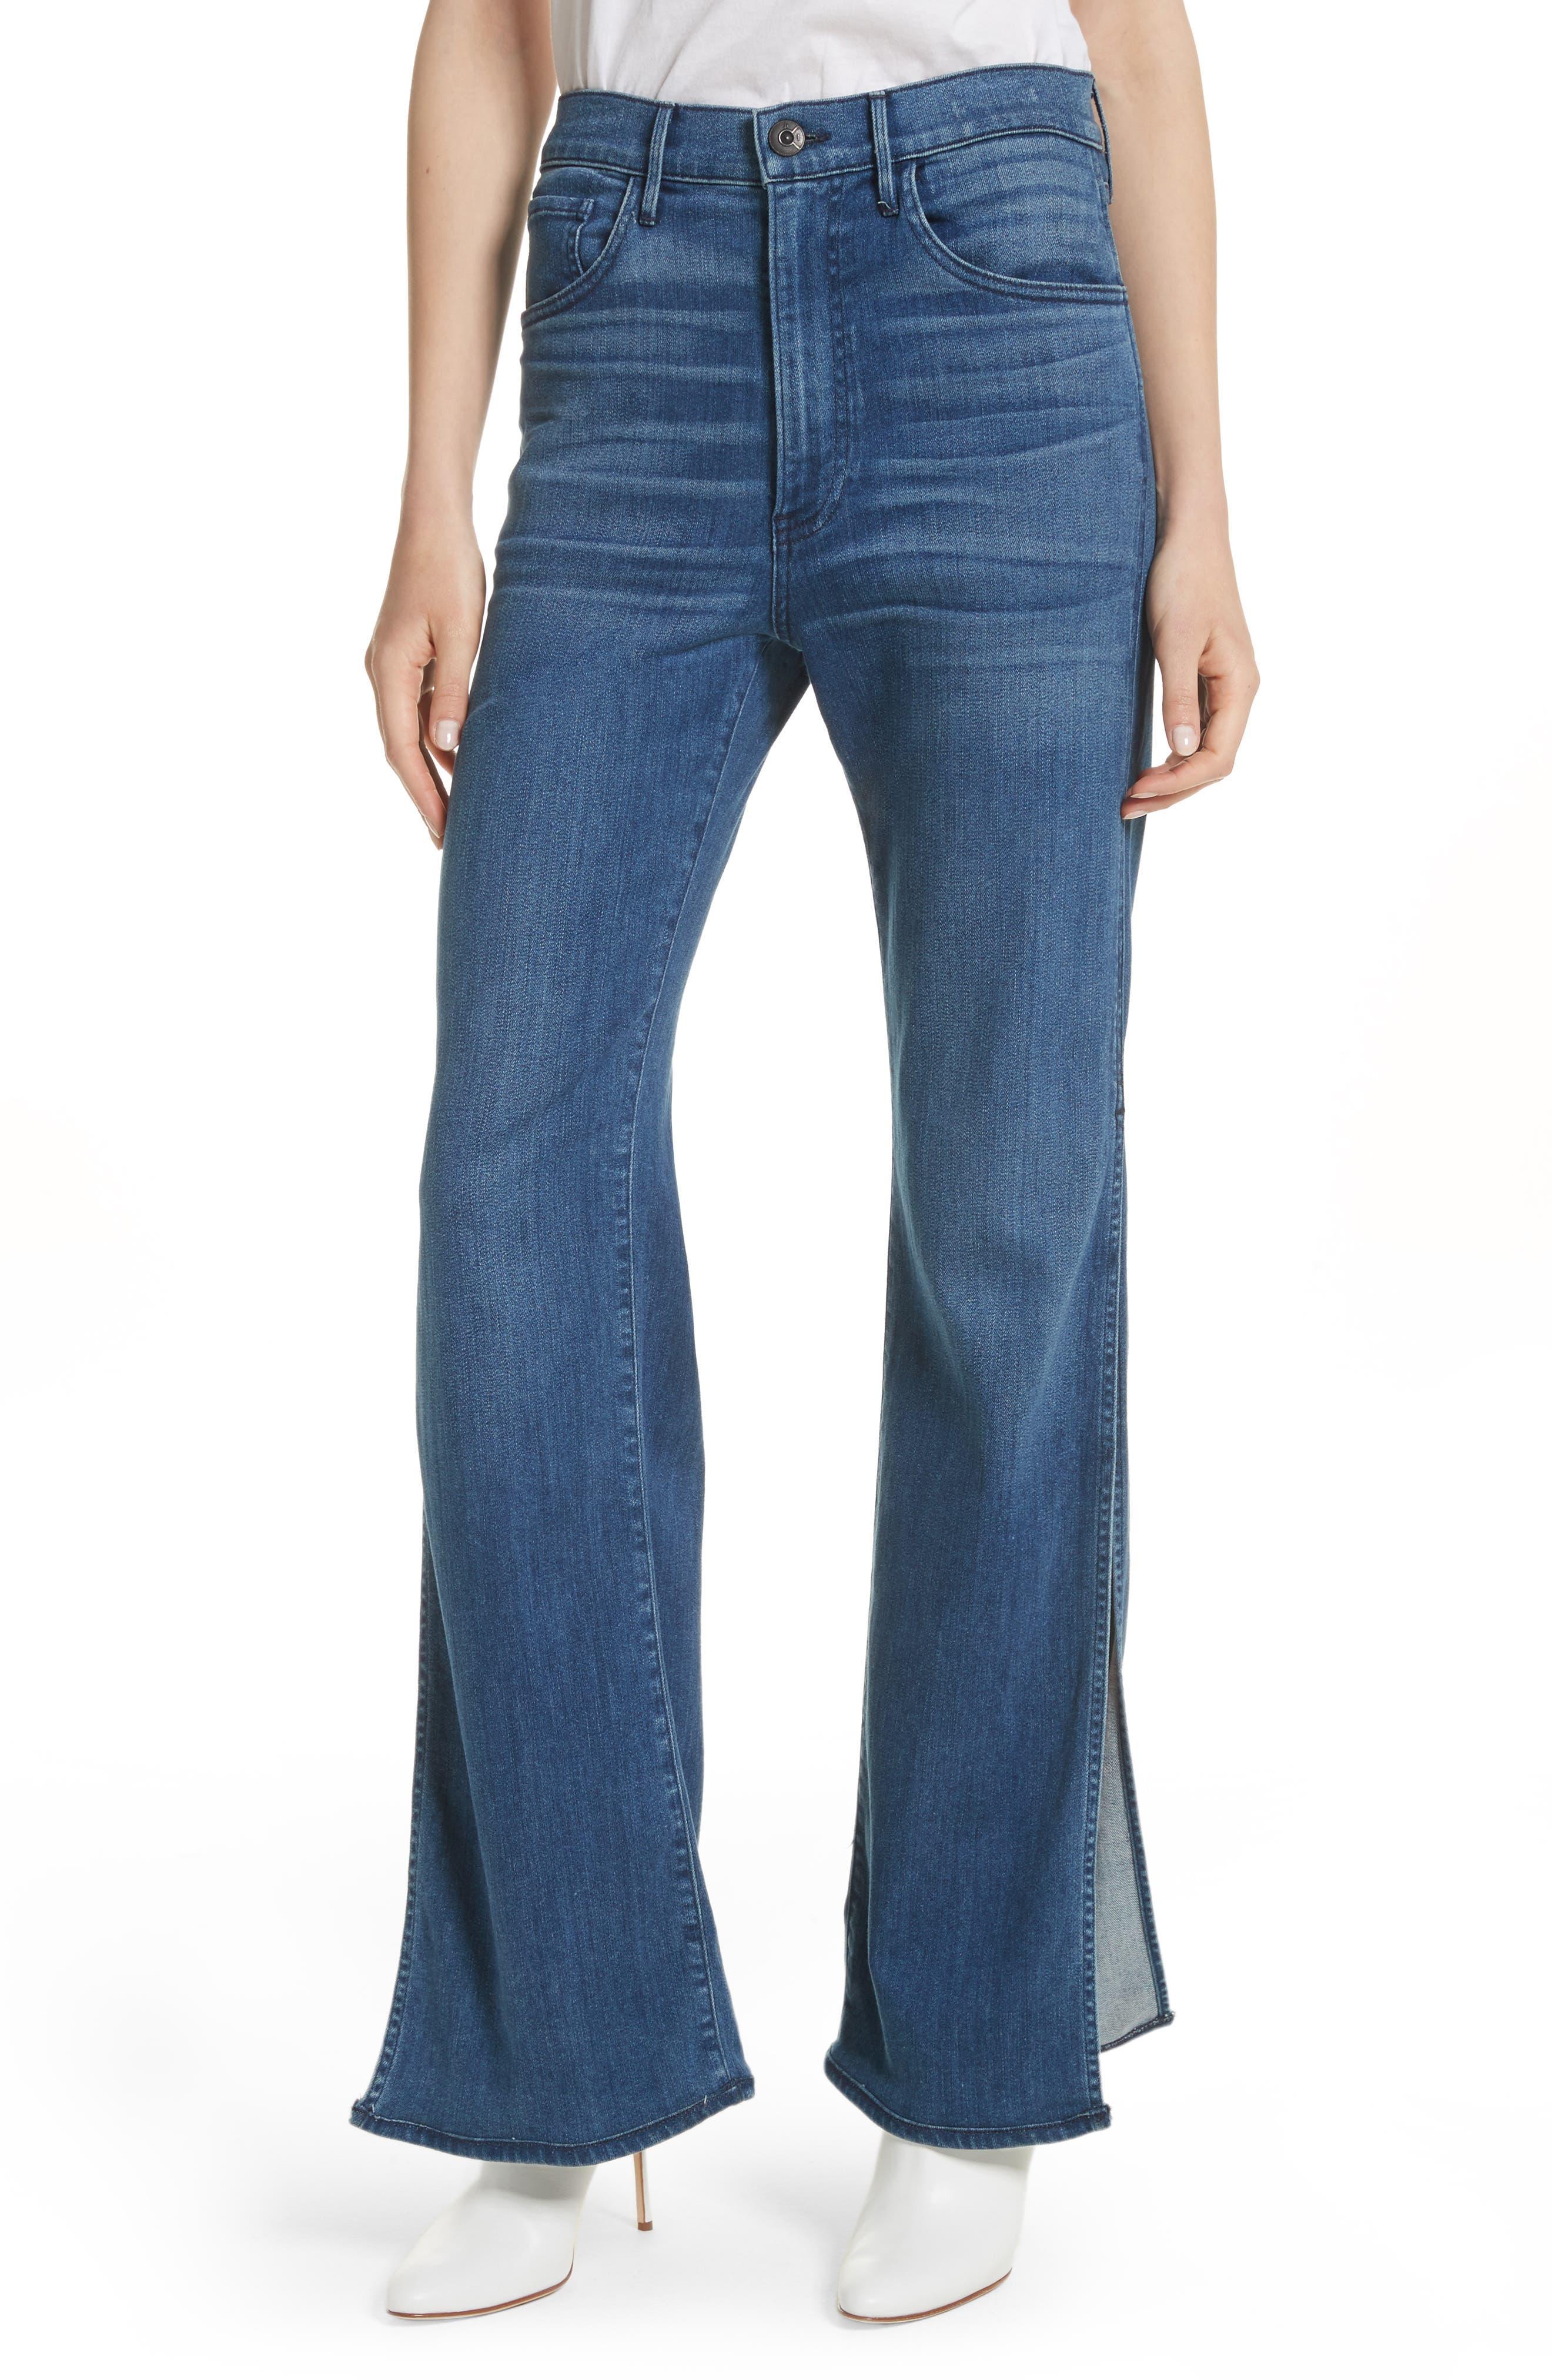 W4 Adeline High Waist Split Flare Jeans,                         Main,                         color, Leia